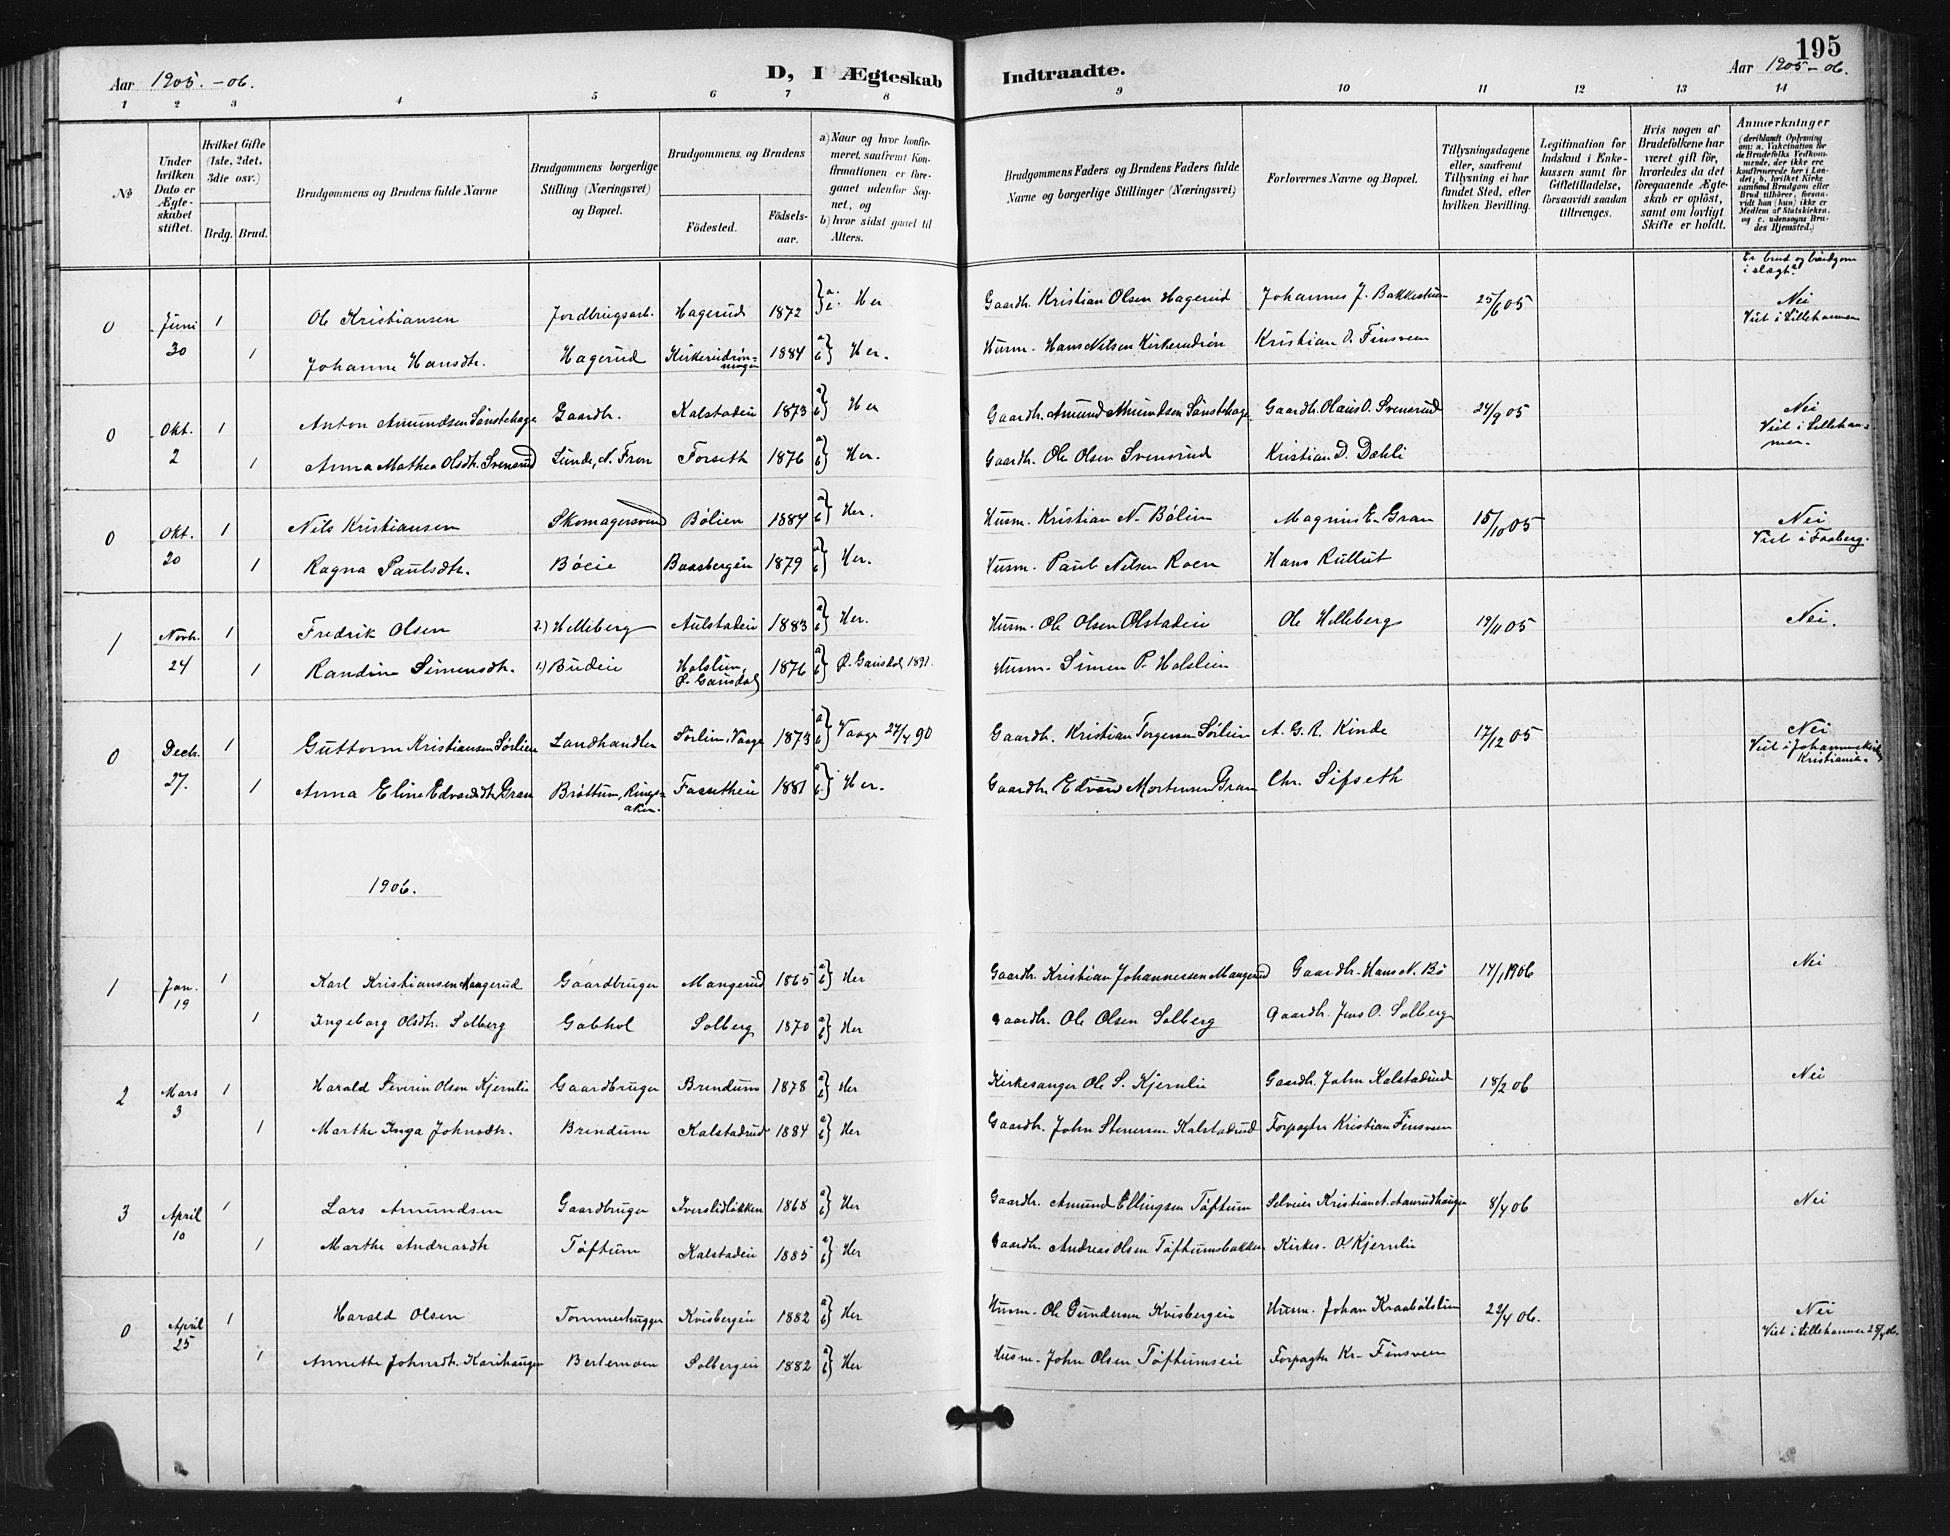 SAH, Vestre Gausdal prestekontor, Klokkerbok nr. 3, 1896-1925, s. 195